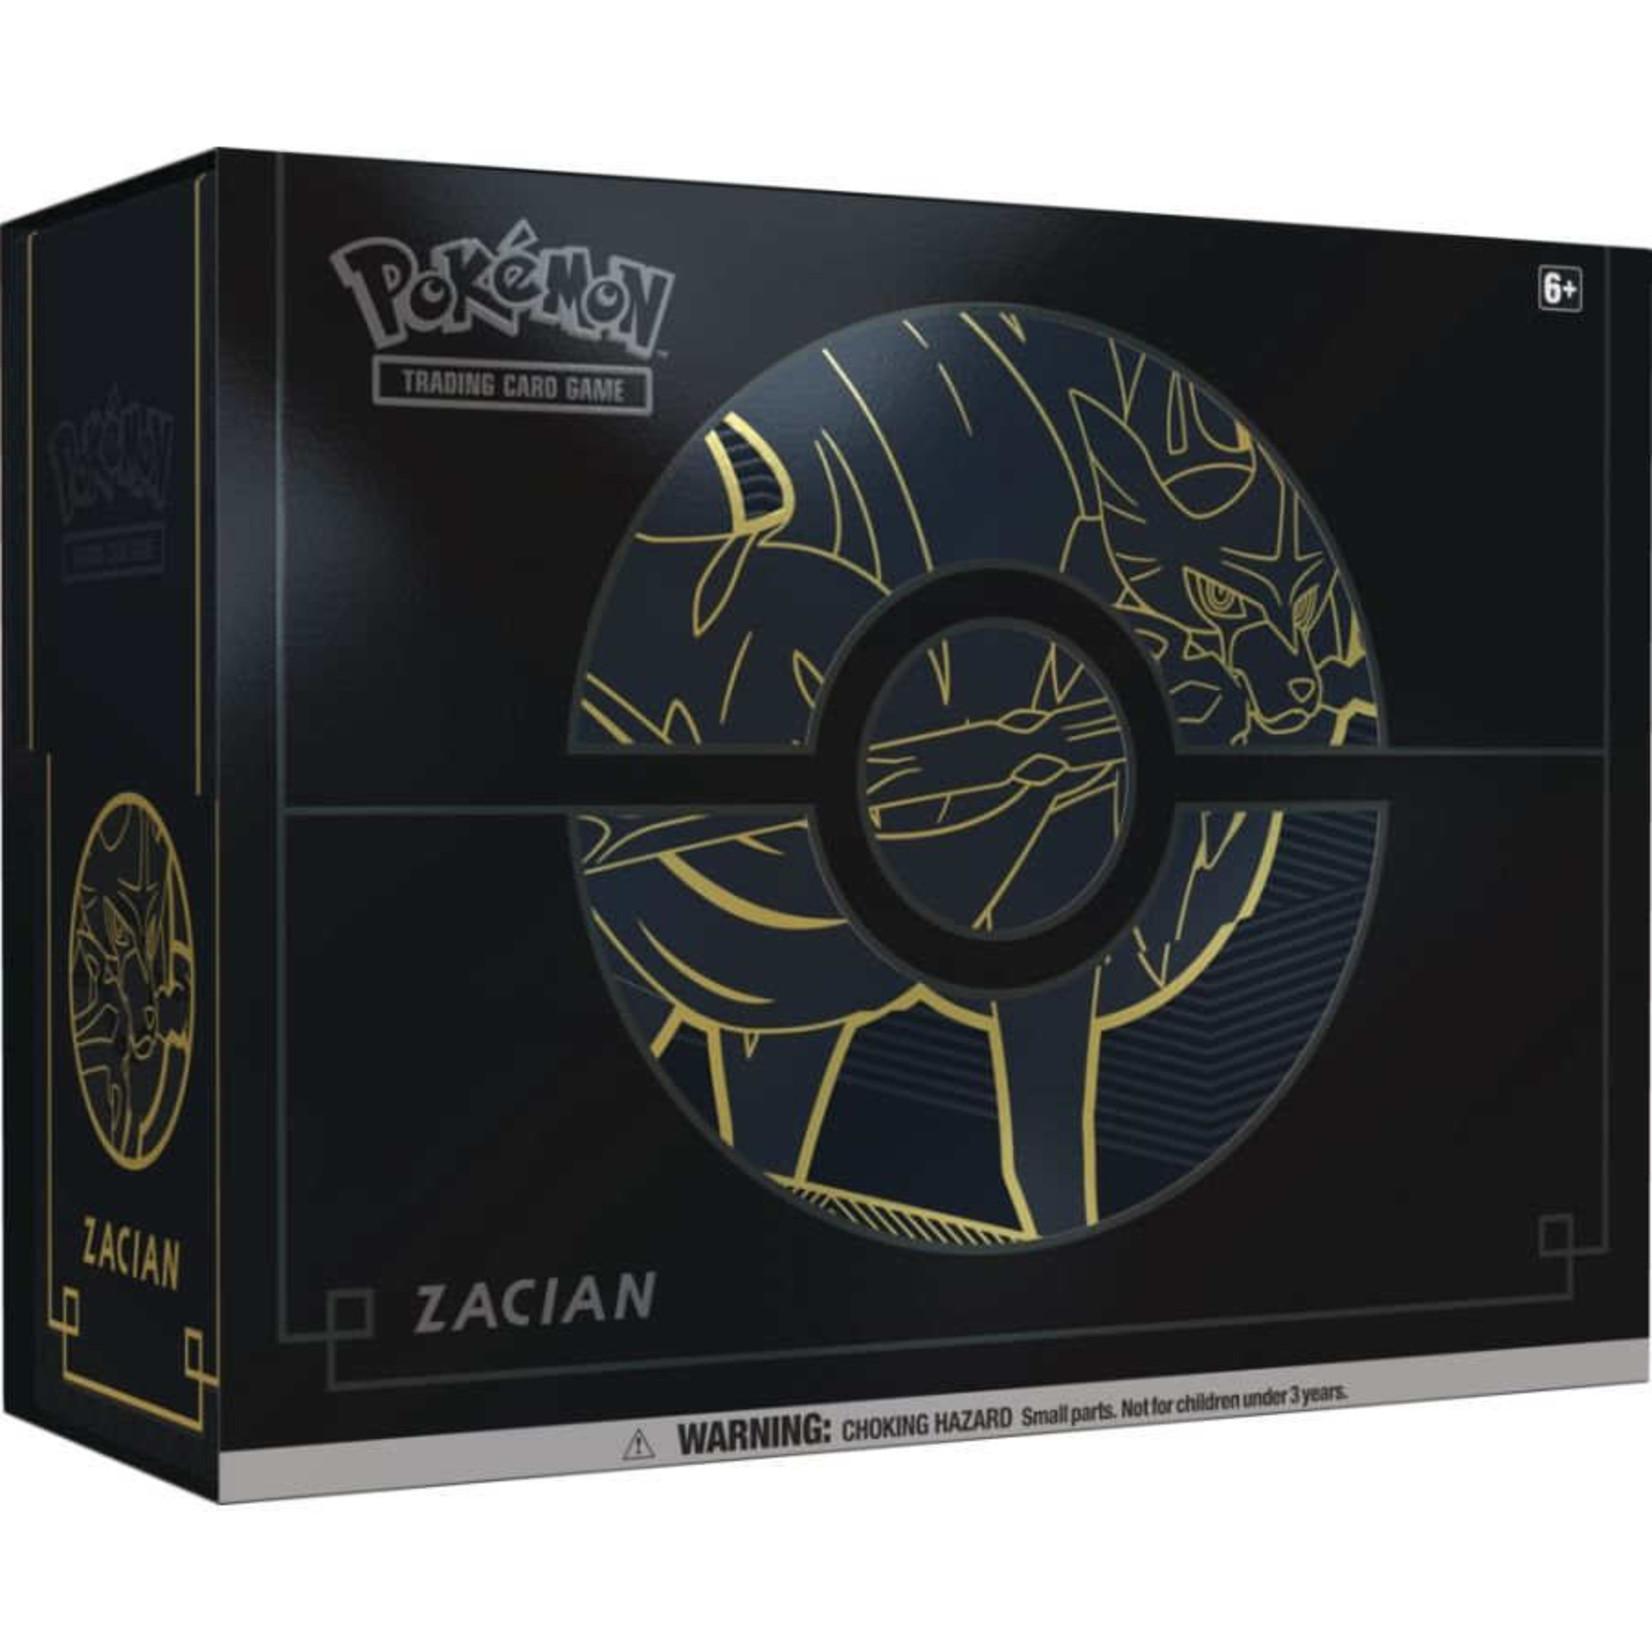 Pokémon Pokémon TCG: Sword & Shield Elite Trainer Box Plus (Zacian)